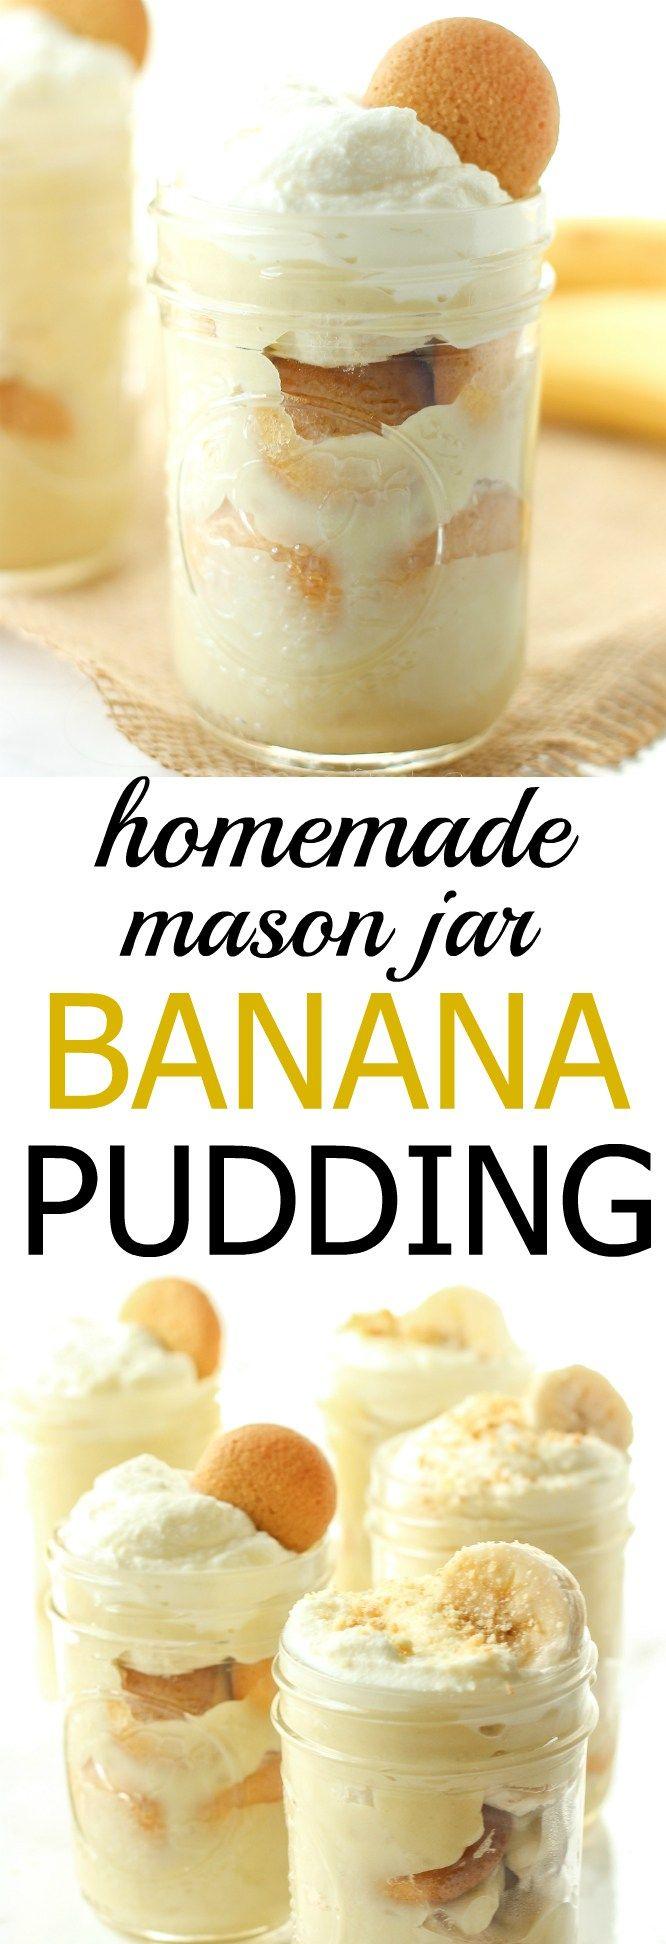 This mason jar banana pudding is 100% homemade and has all real ingredients!